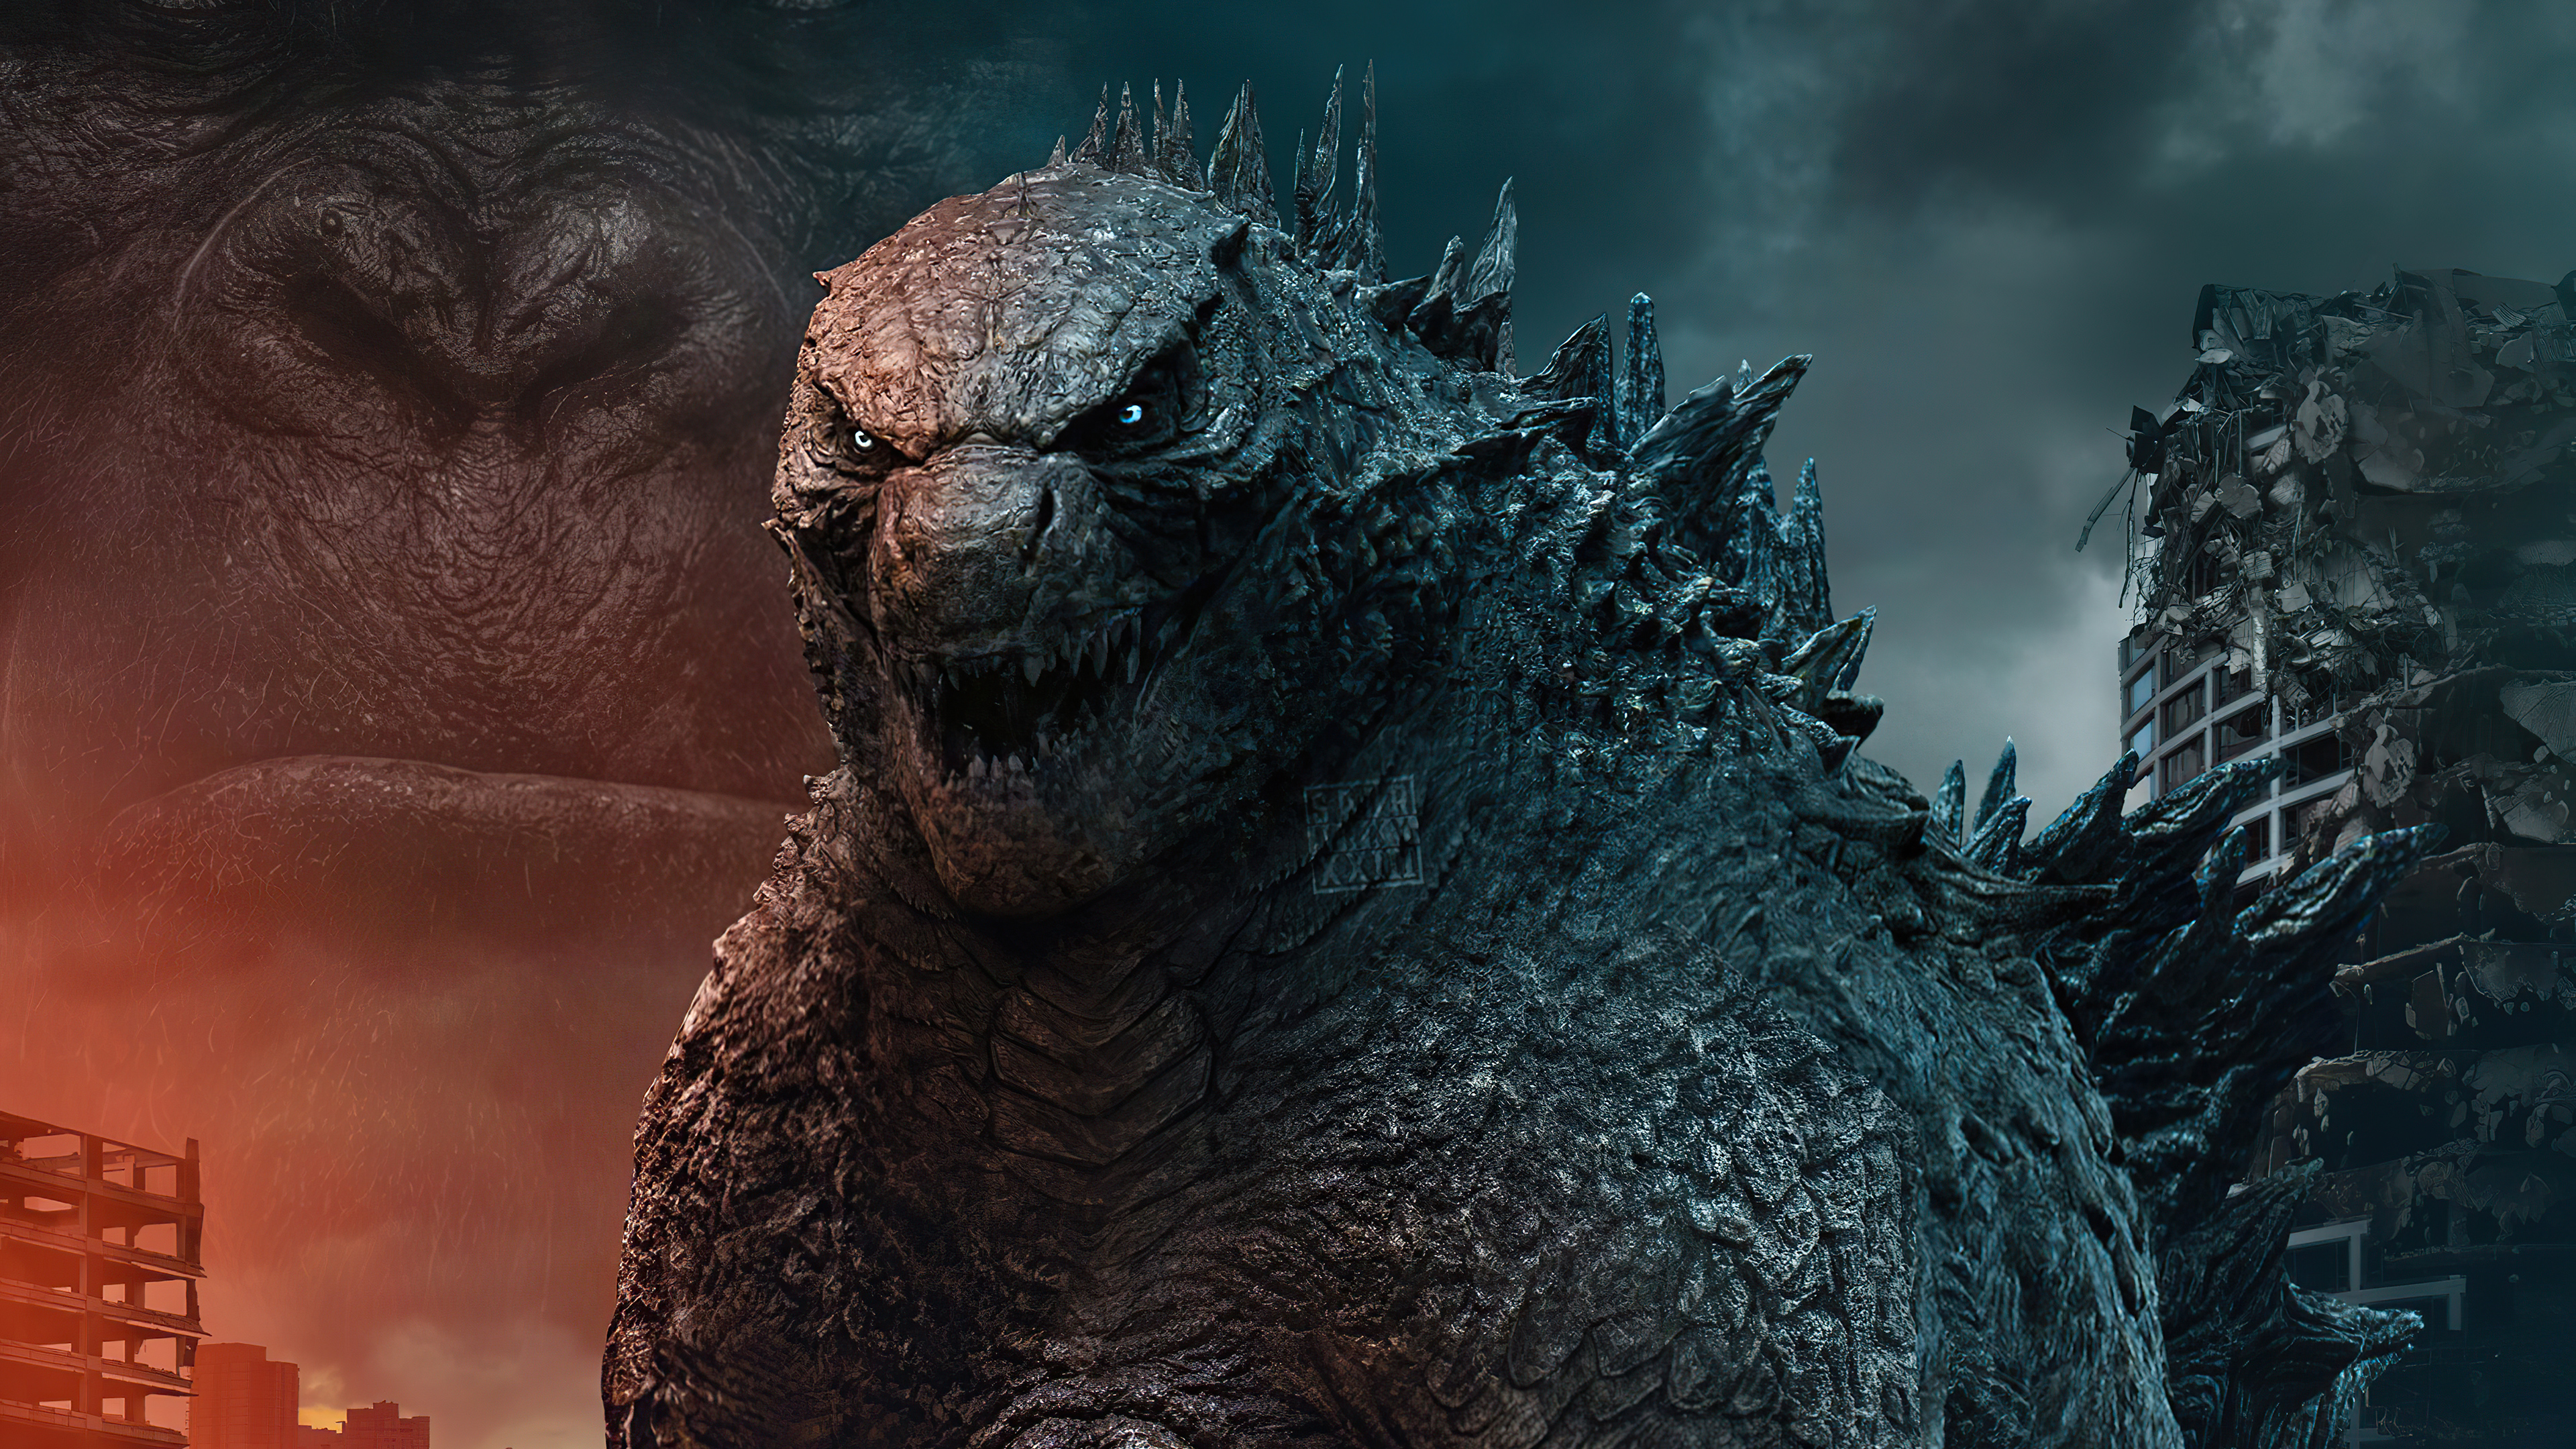 Fondos de pantalla Godzilla contra King Kong 2021